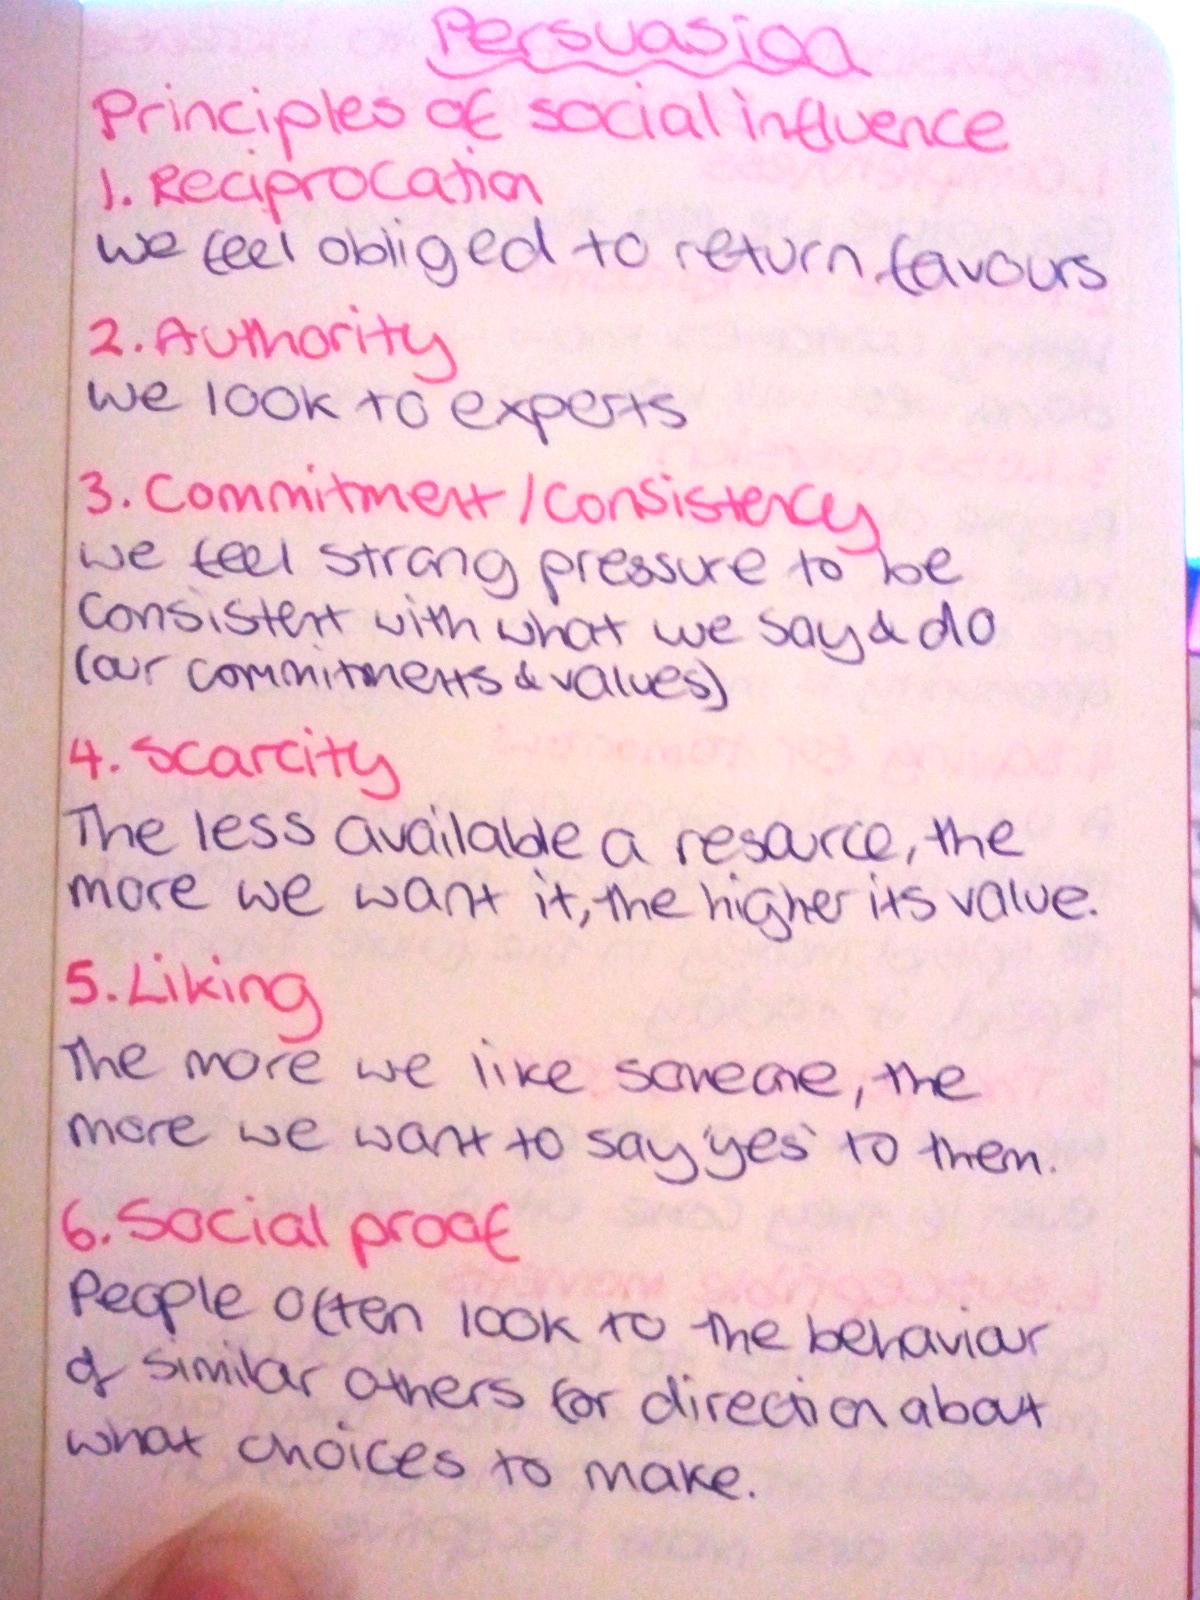 Principles of persuasion image